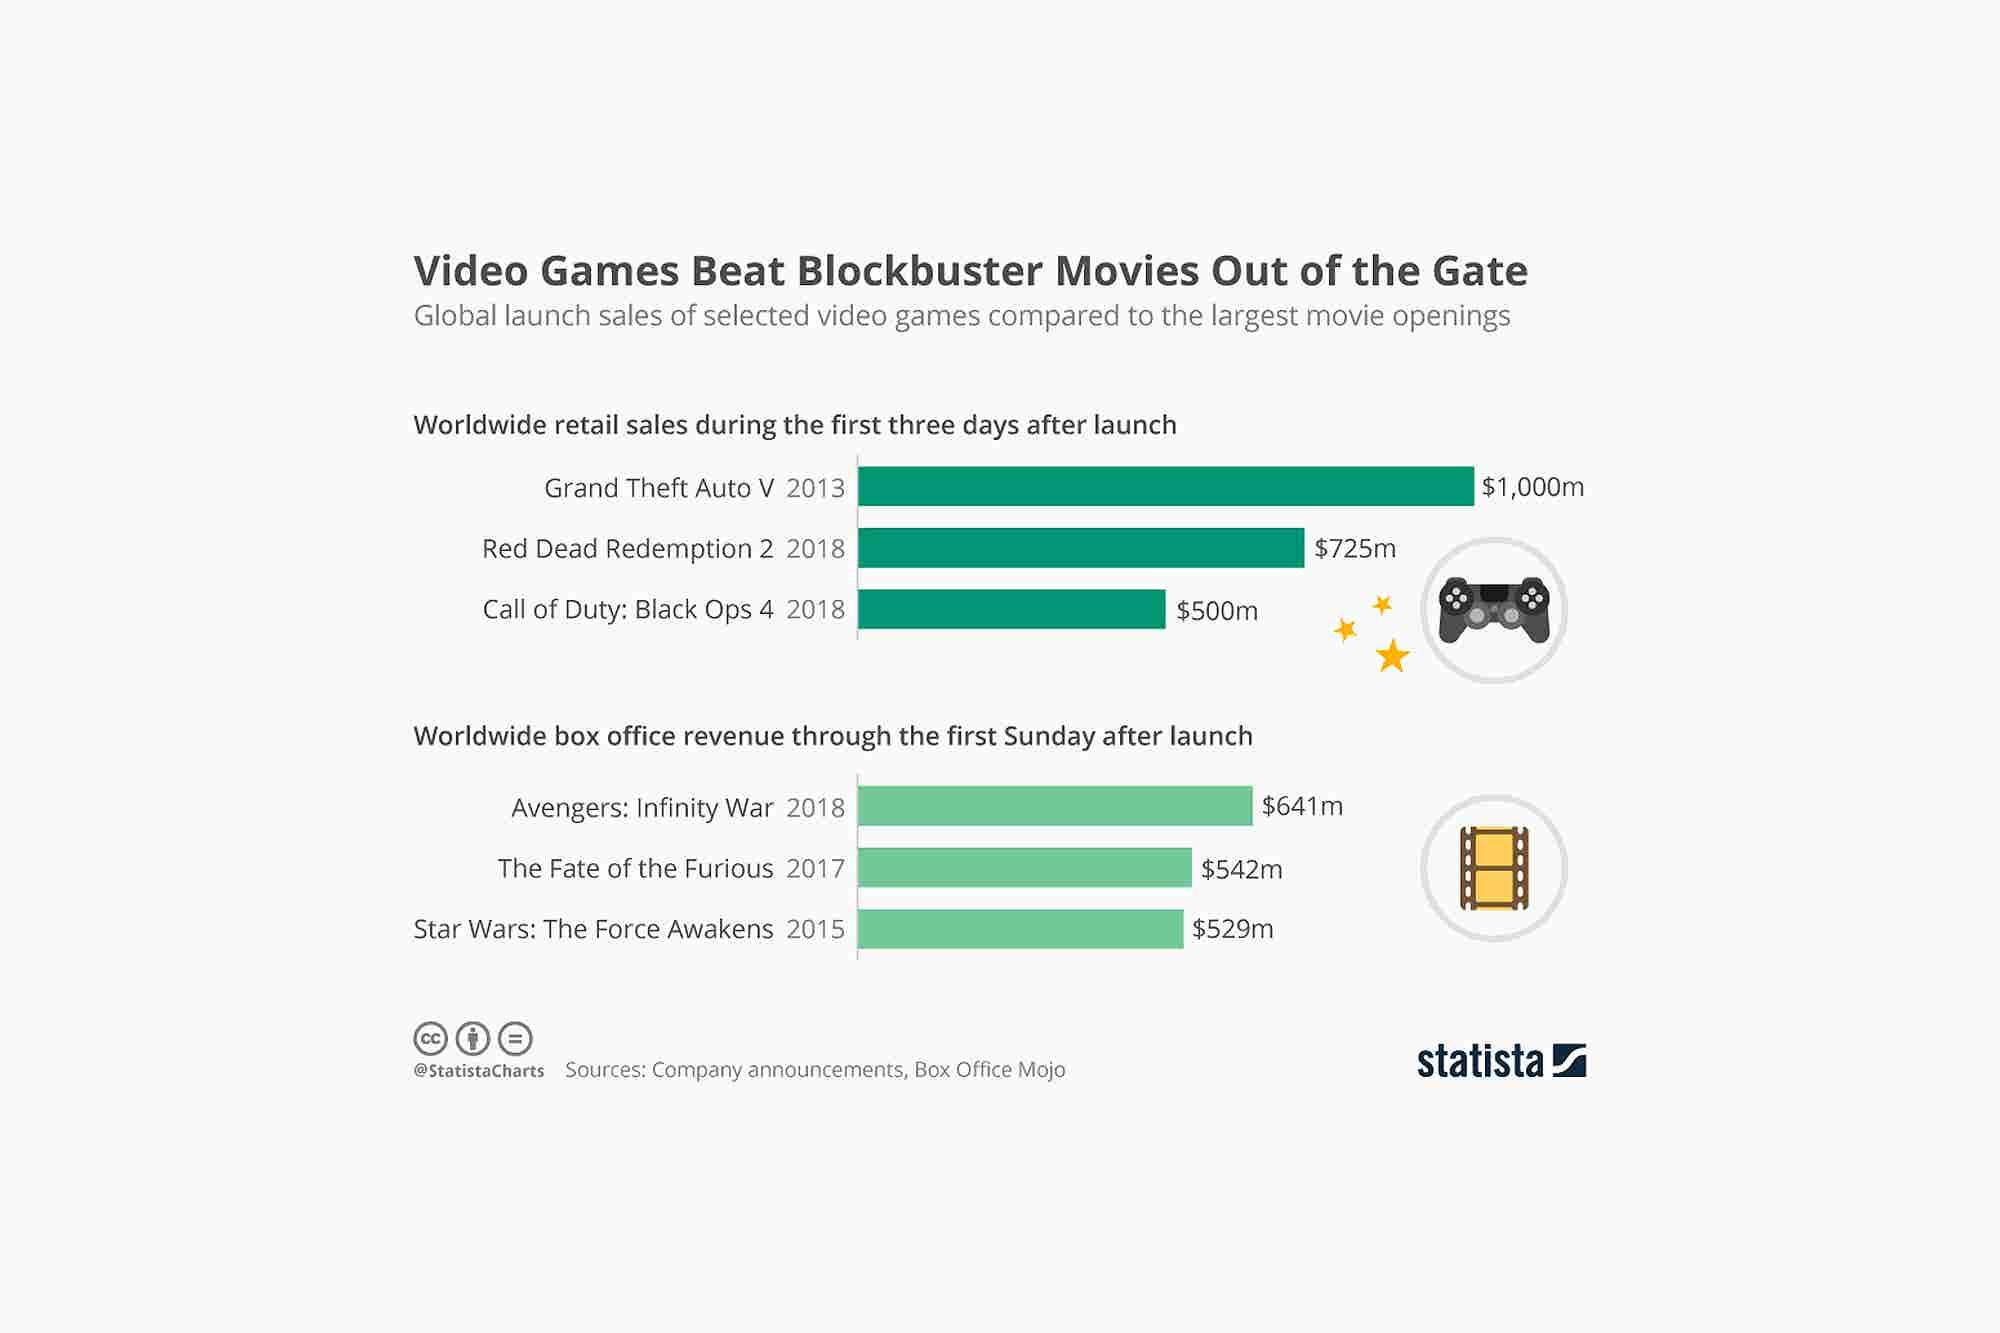 Major Video Games Make More Money Than Blockbuster Movies